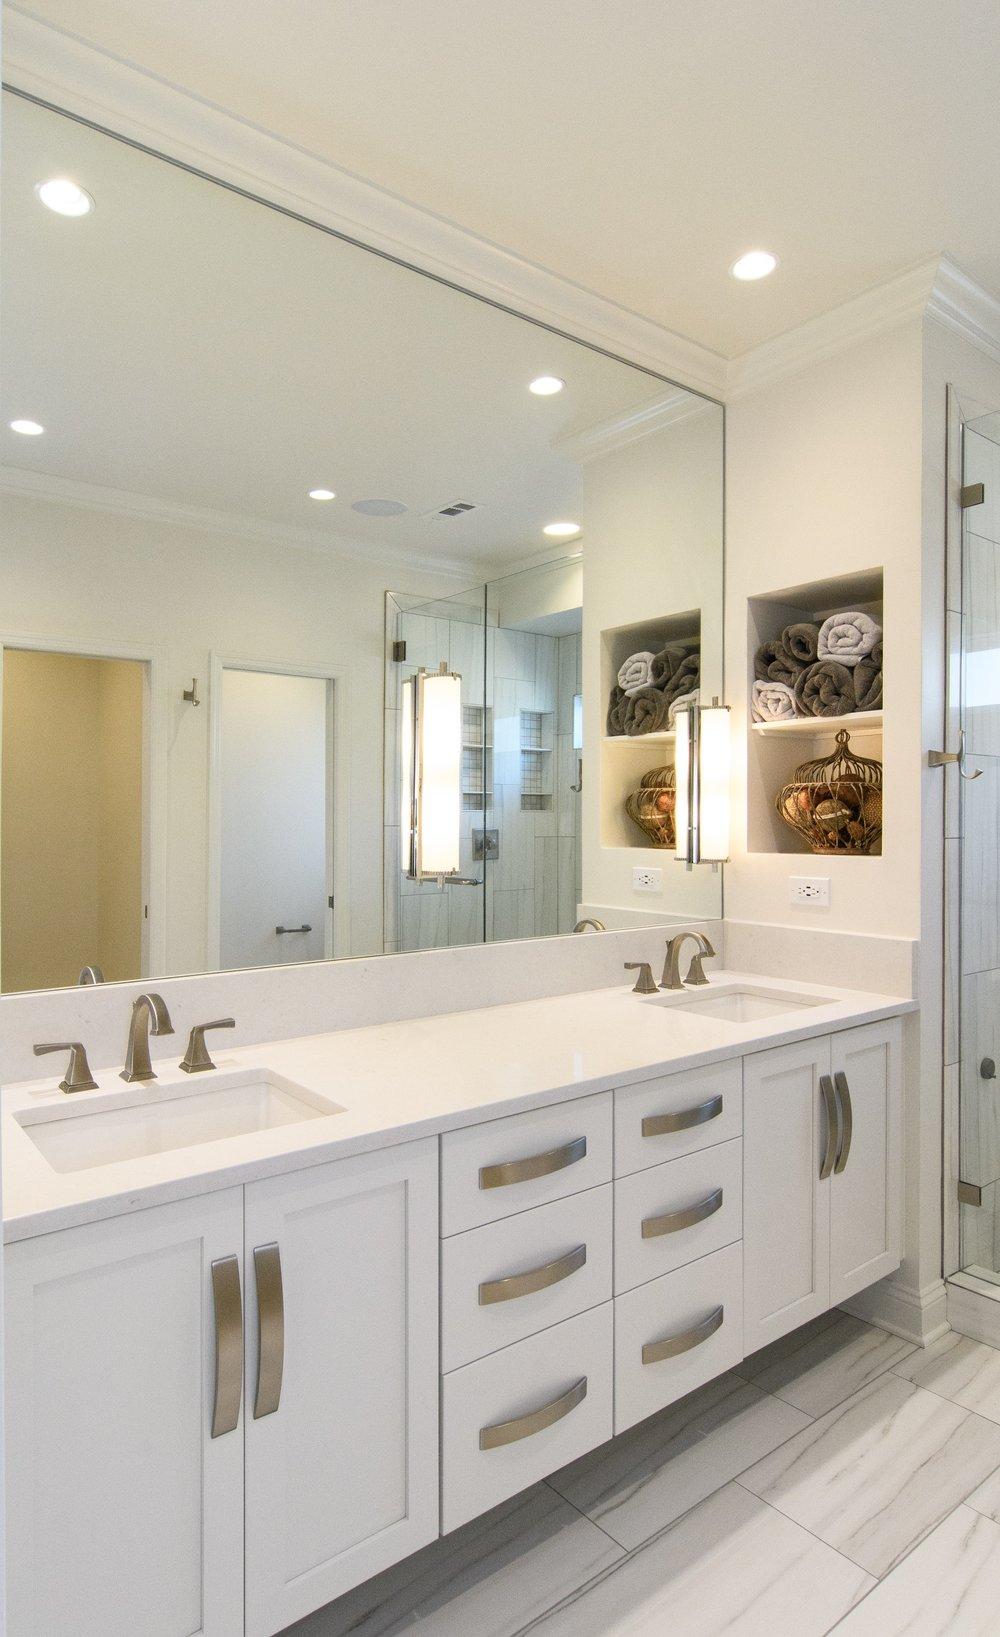 White painted cabinets, quartz countertops, rectangular undermount sinks, mirror lights, niche, large format tile, Vestavia Hills, Liberty Park, Alabama, Remodel, Renovation.